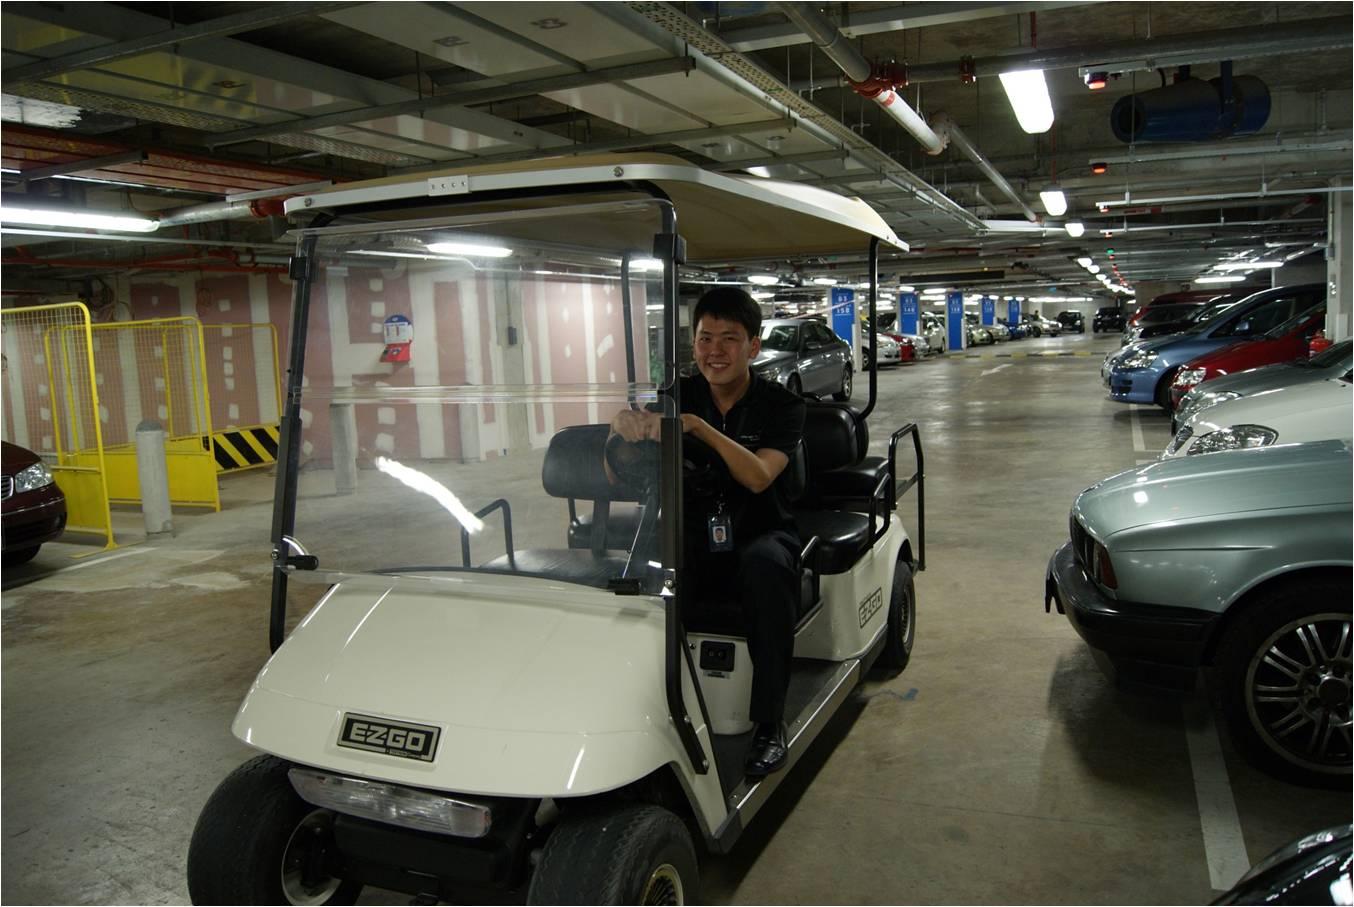 Circontrol Parking Guidance System in Marina Bay